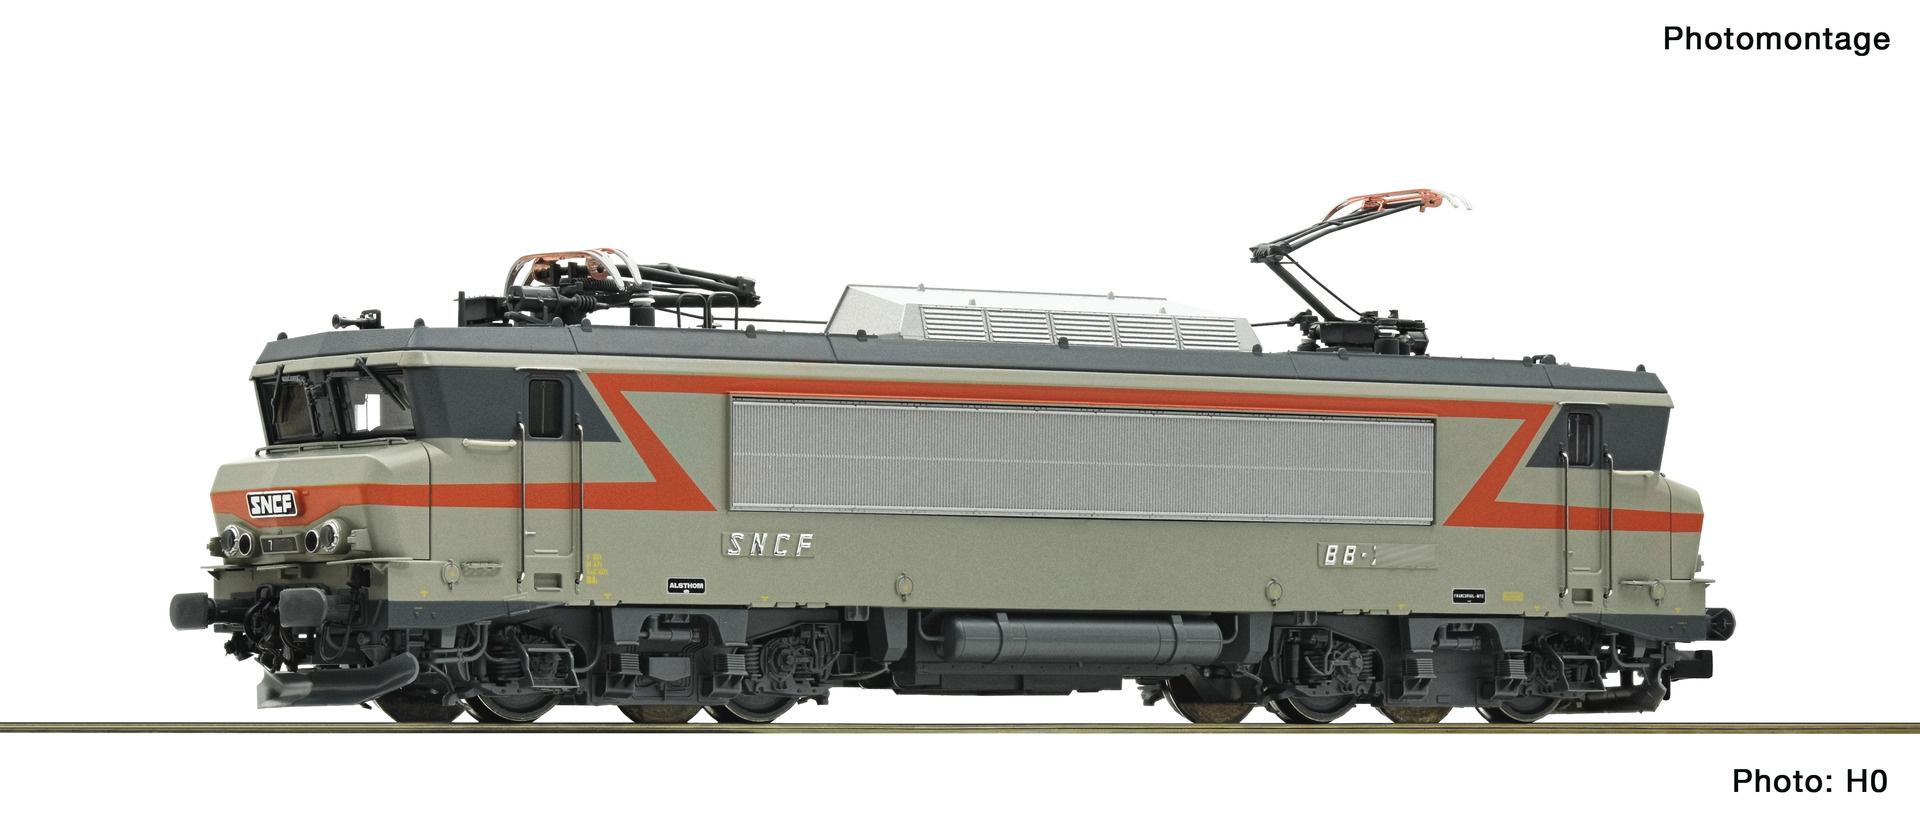 732205 E-Lok BB 7200 Beton SND.-1